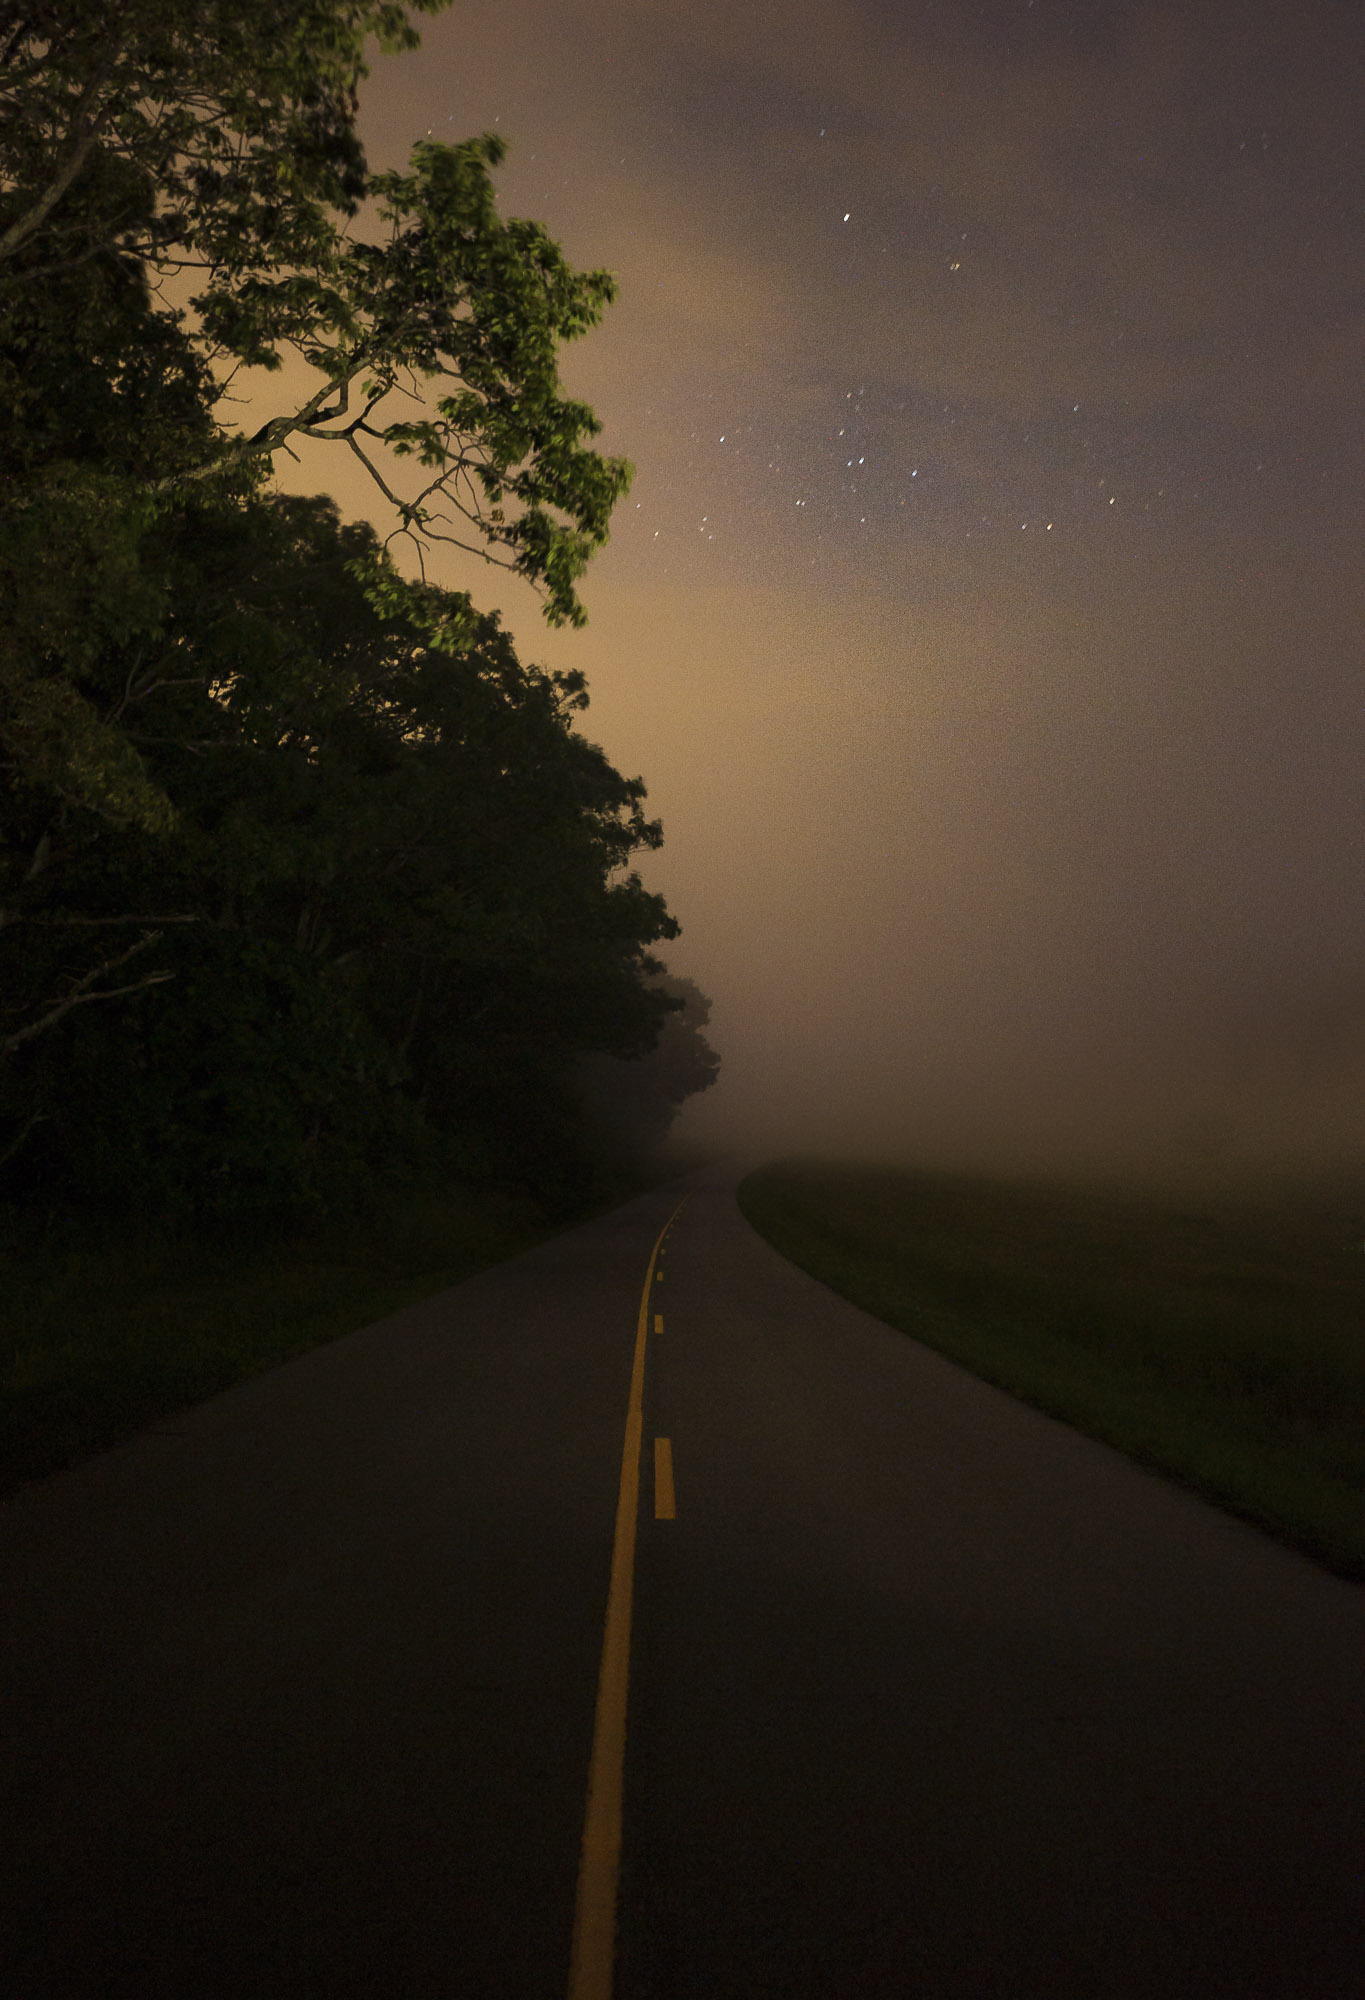 Blue Ridge Parkway_Nicholson__DSC1817-E.jpg